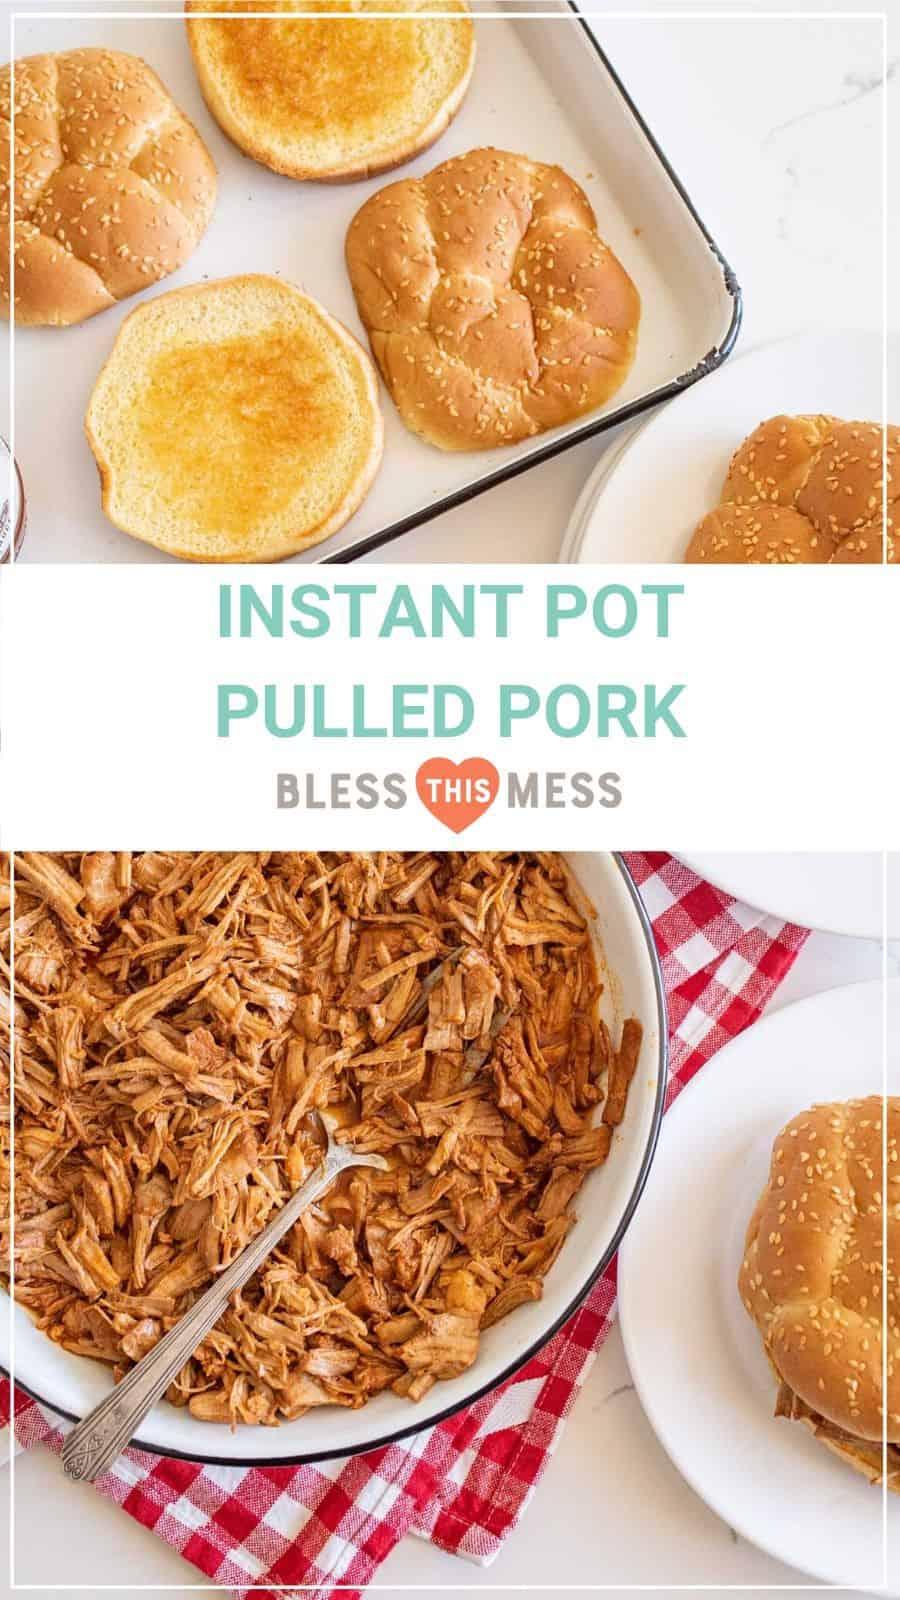 instant pot pulled pork recipe pin